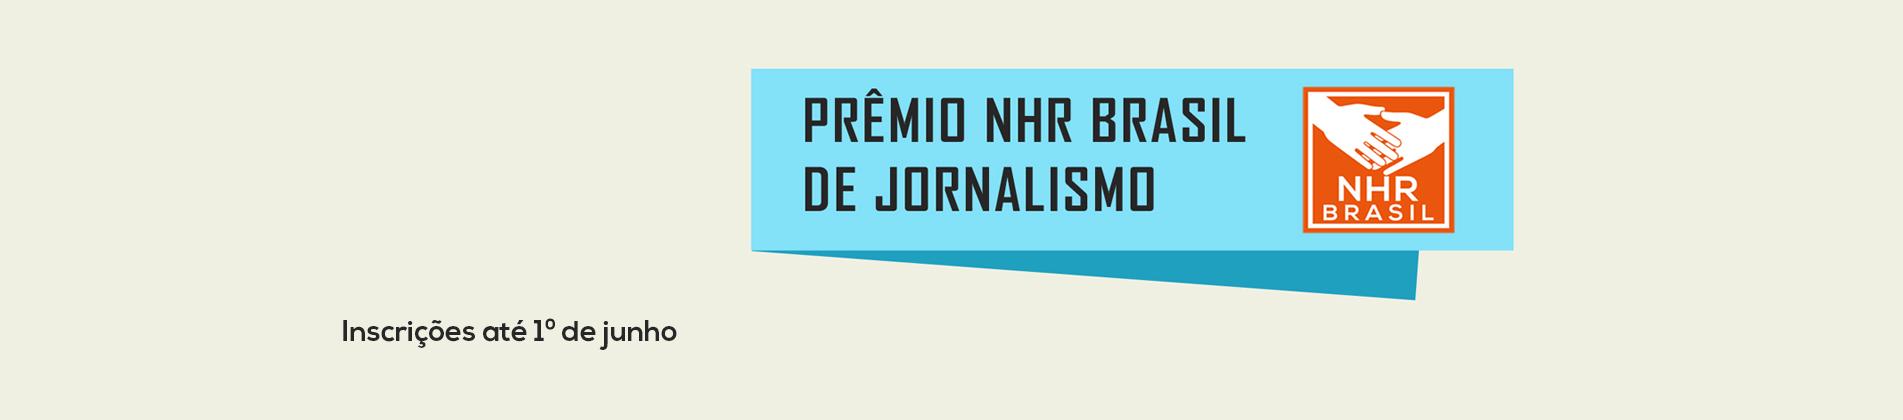 premio-jornalismo-banner-para-site